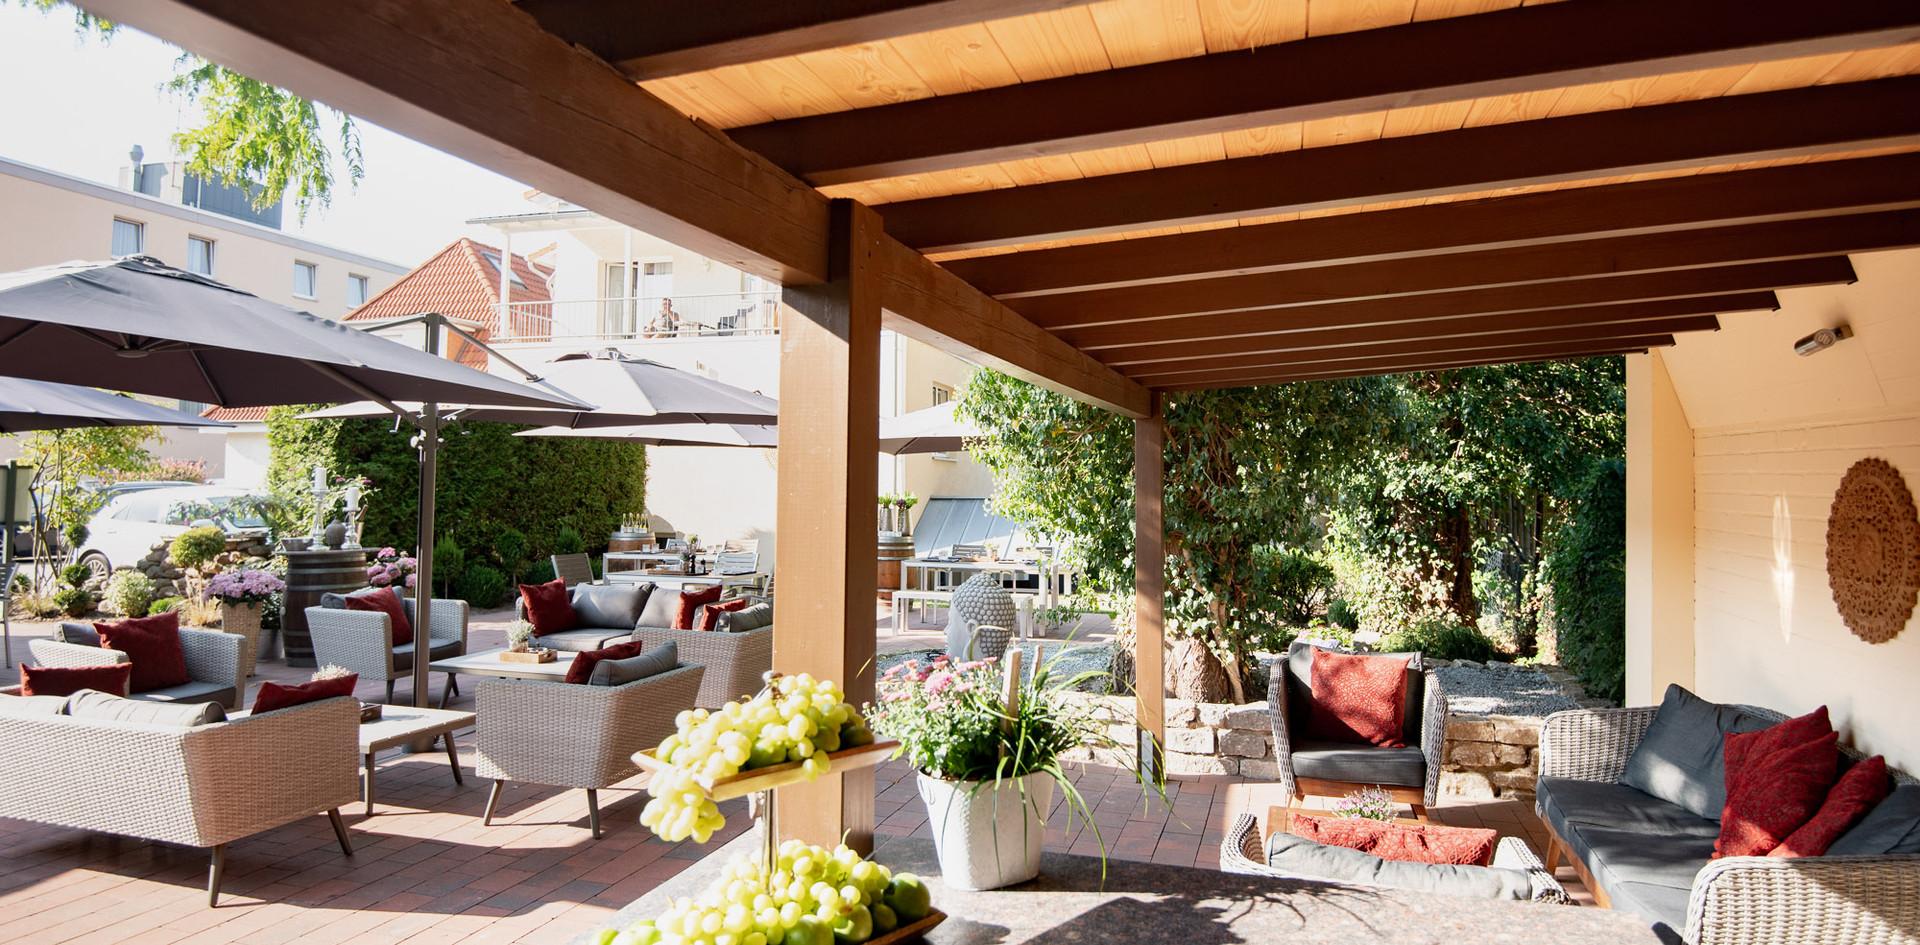 warme Gartenterrasse Hotel Wegner - the culinary art hotel